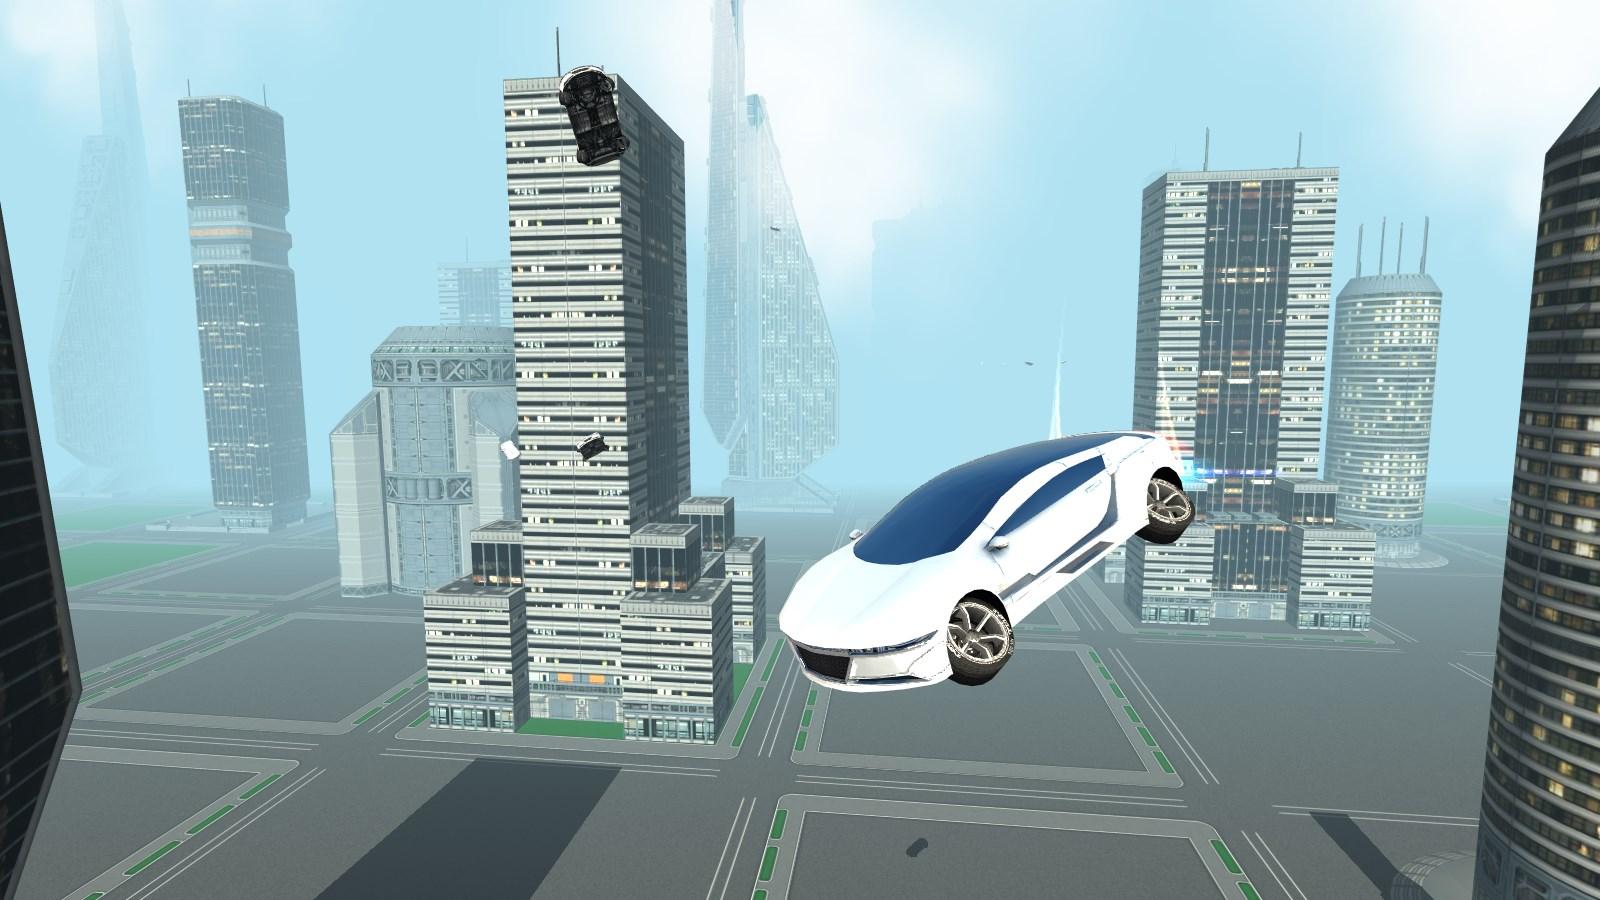 Futuristic Flying Car Driving - Imagem 1 do software